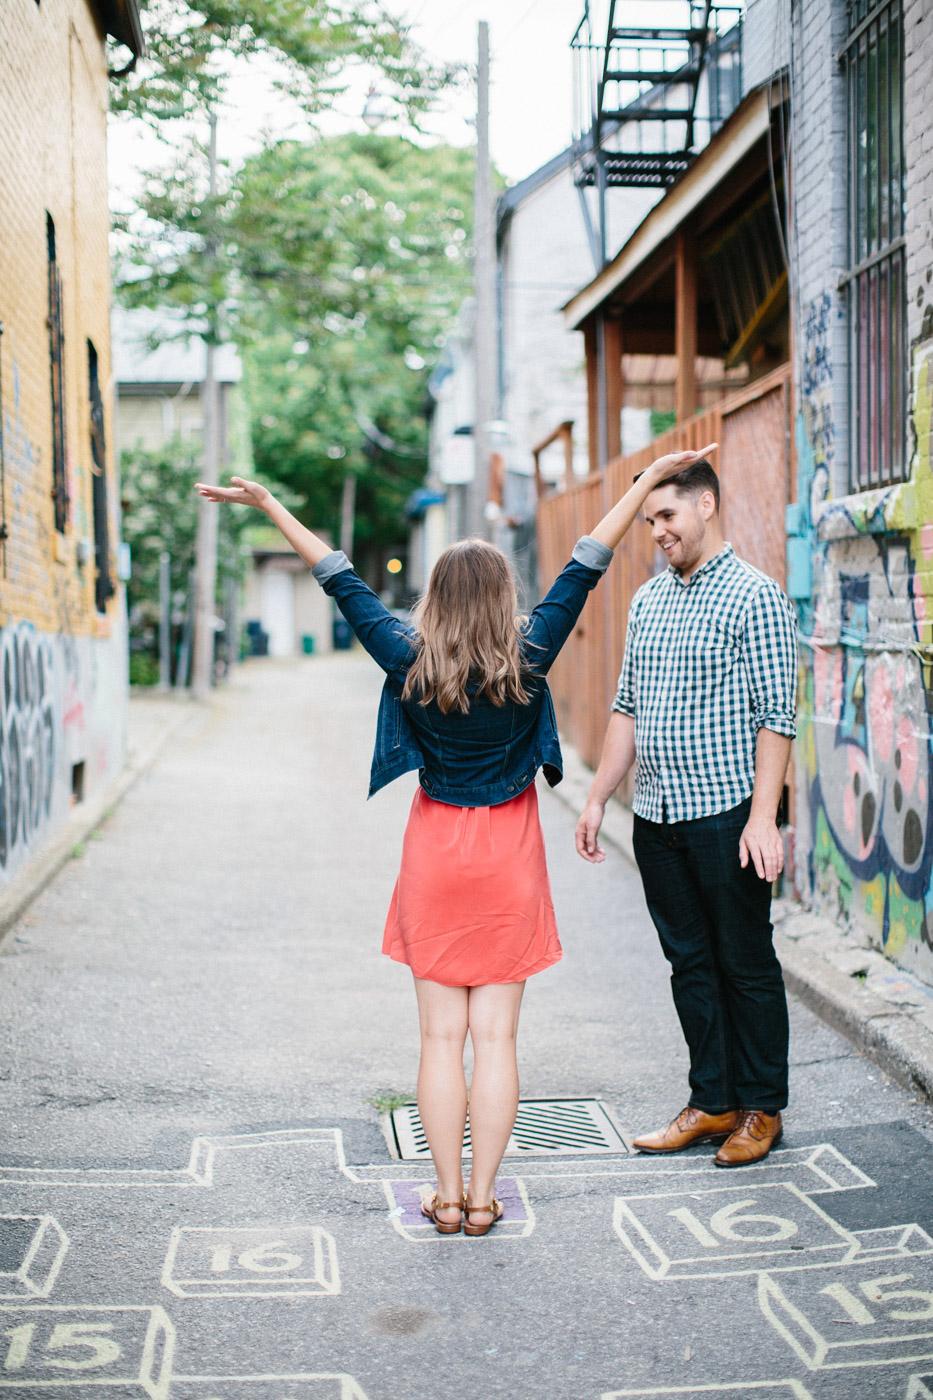 toronto_wedding_photographer_engagement_photography_tips-42.jpg